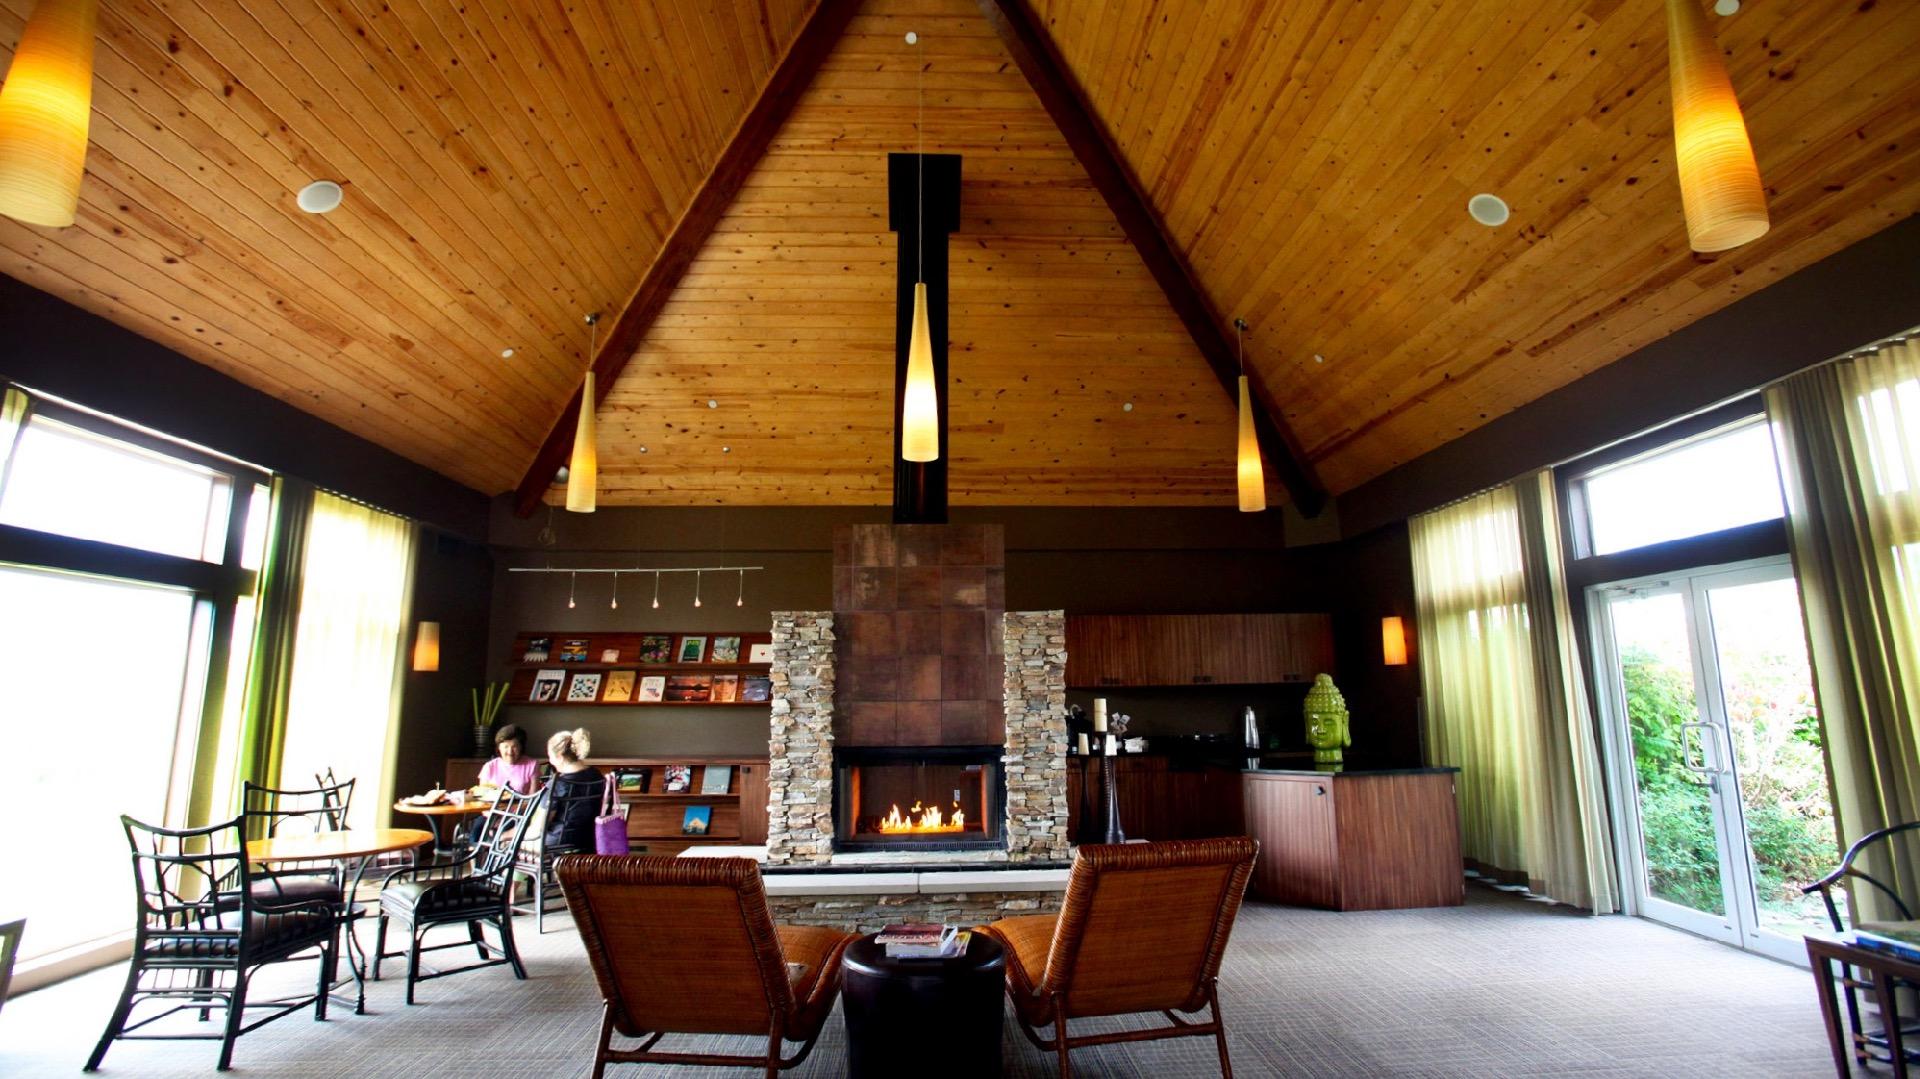 Spa Walden Aurora Ohio Spas Of America